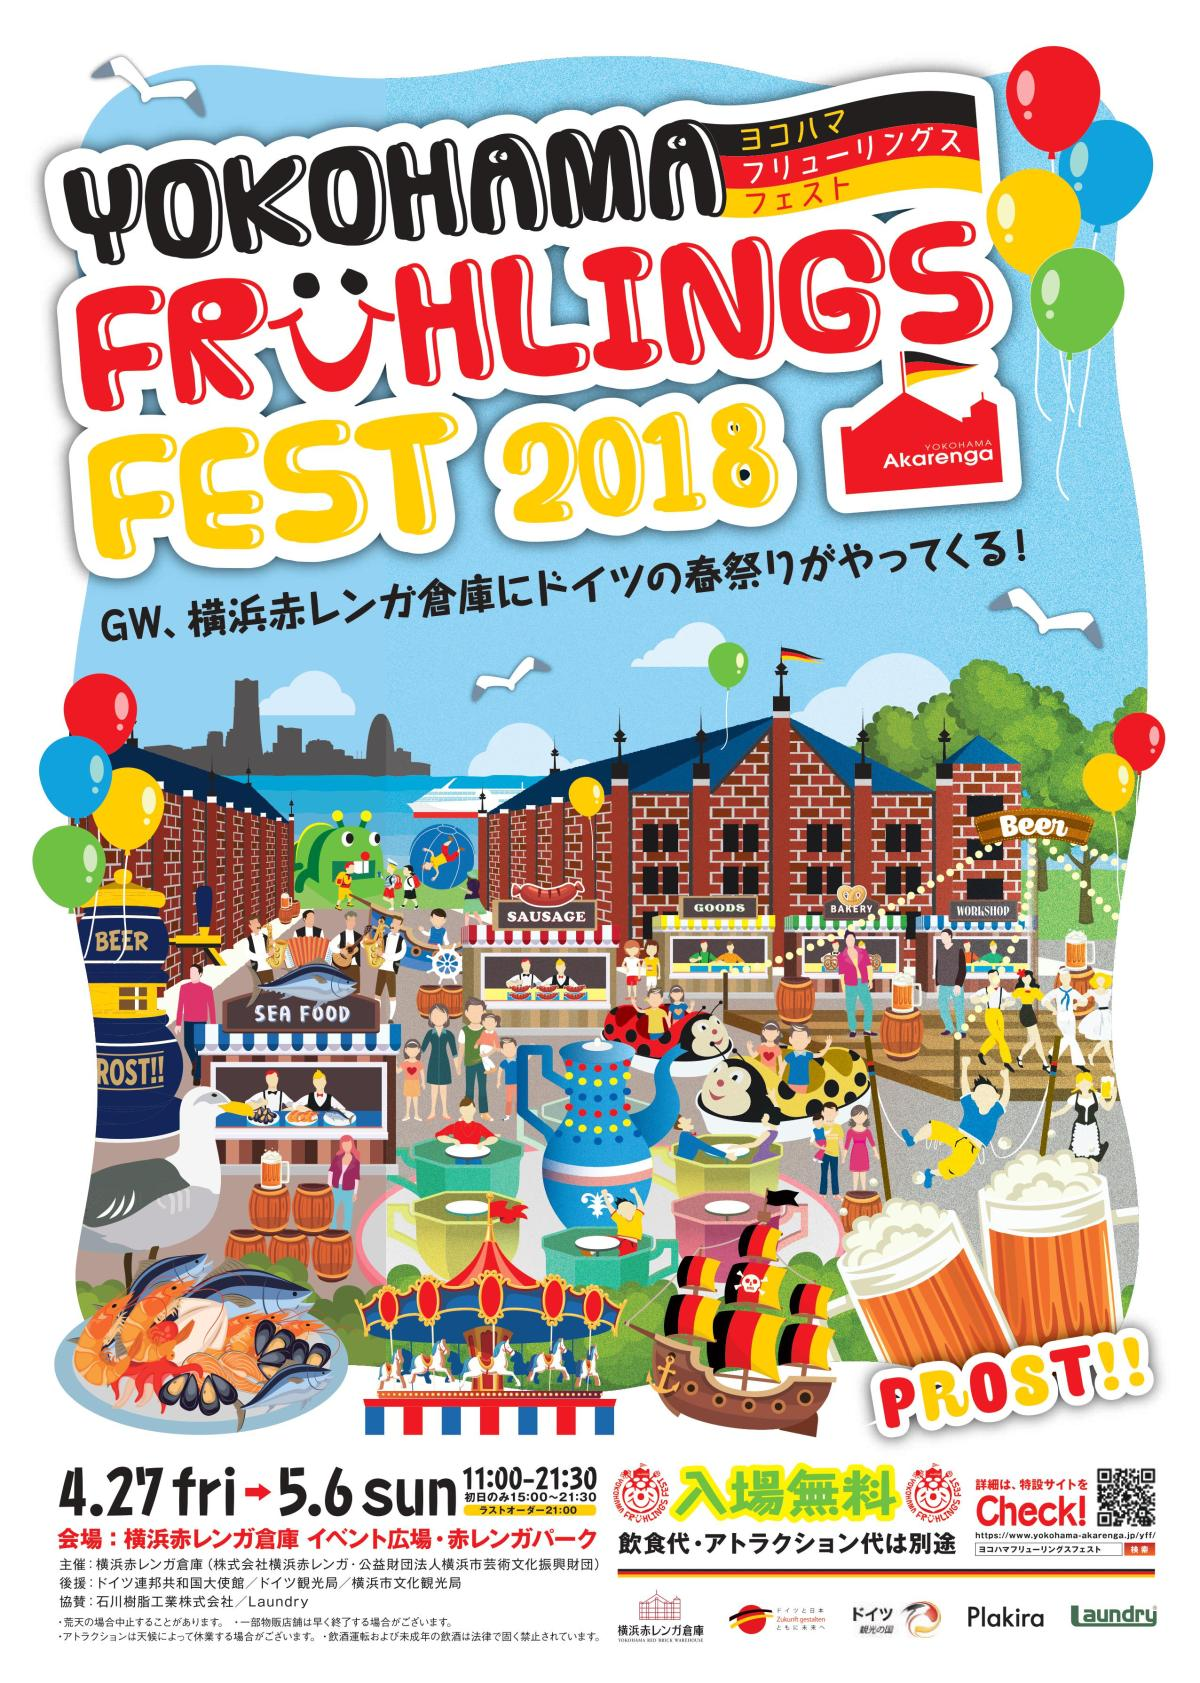 GW、横浜赤レンガ倉庫にドイツの春祭りがやってくる!ヨコハマフリューリングスフェスト2018